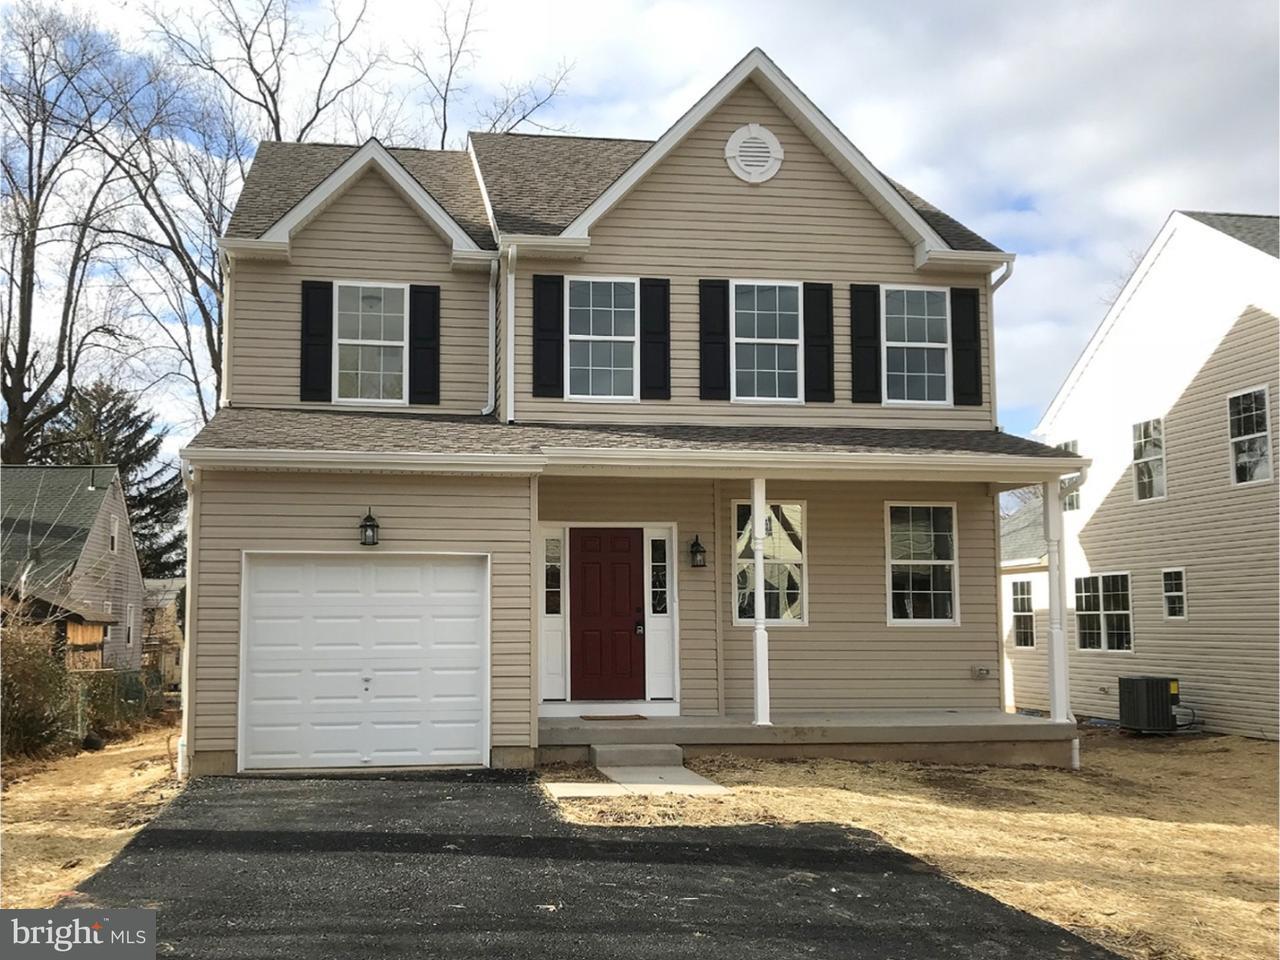 Single Family Home for Sale at 335 LANCASTER Avenue Hatboro, Pennsylvania 19040 United States